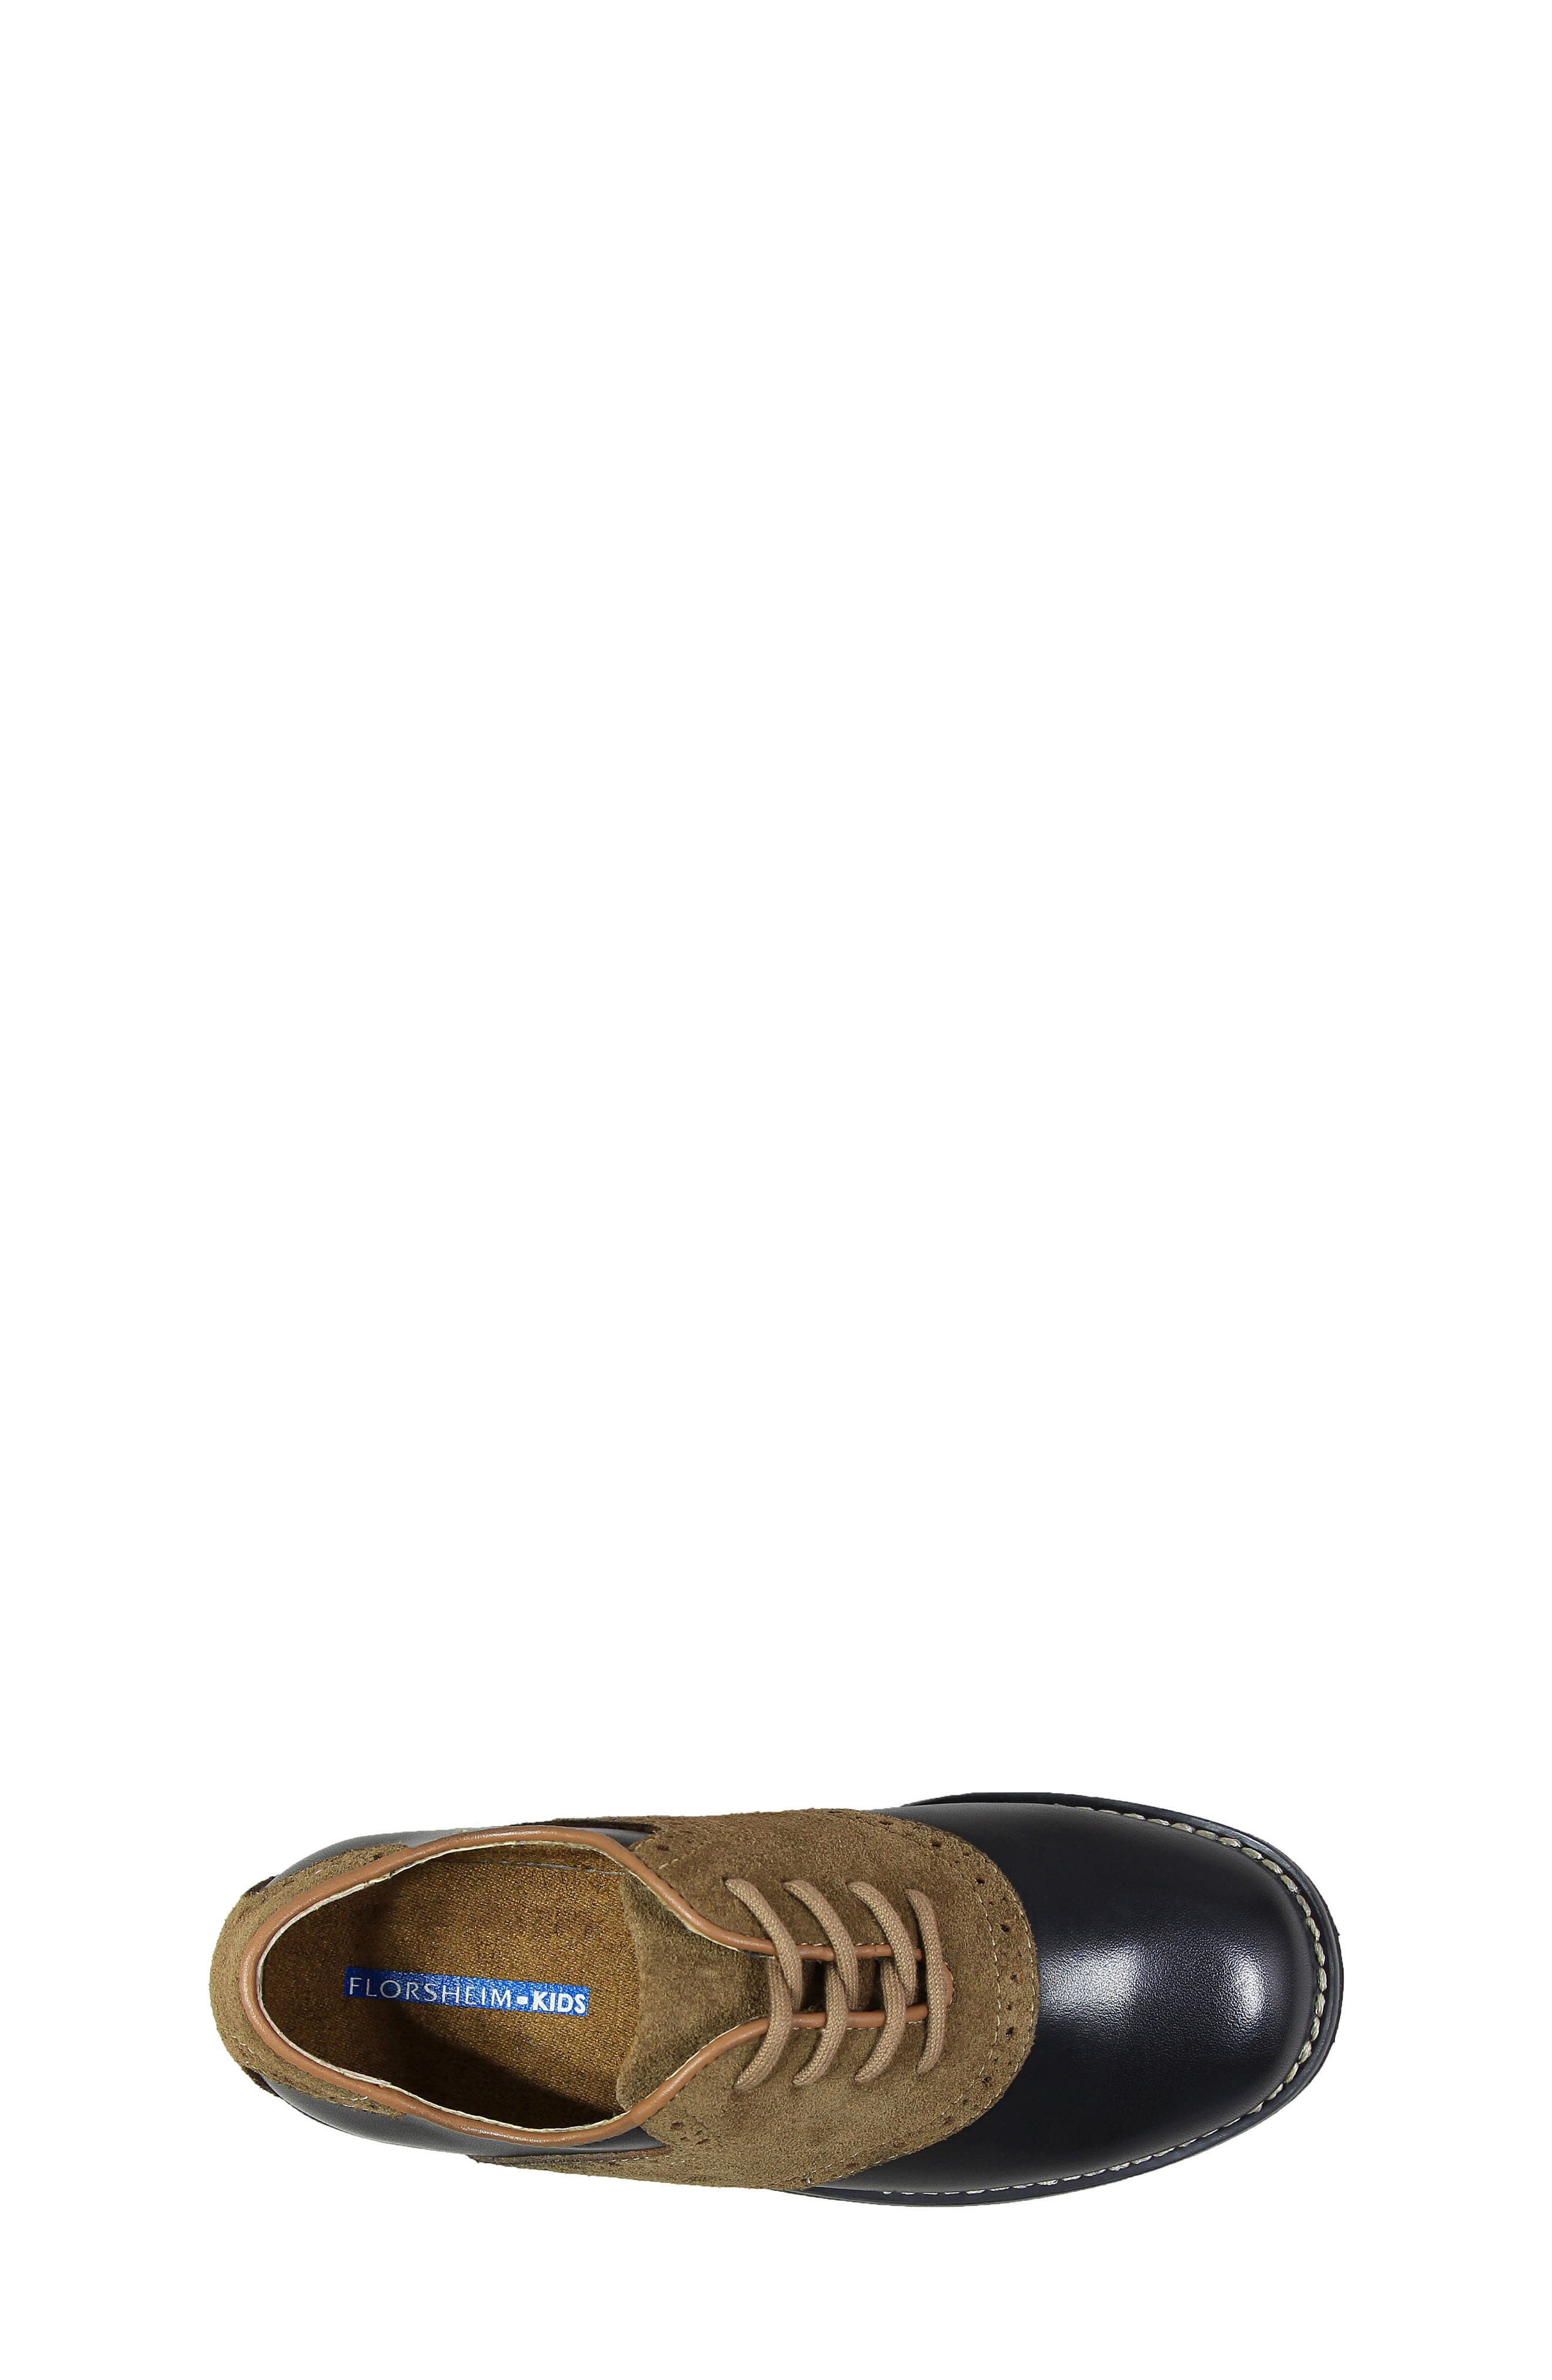 'Kennett Jr. II' Saddle Shoe,                             Alternate thumbnail 4, color,                             SMOOTH BLACK W/ MOCHA SUEDE